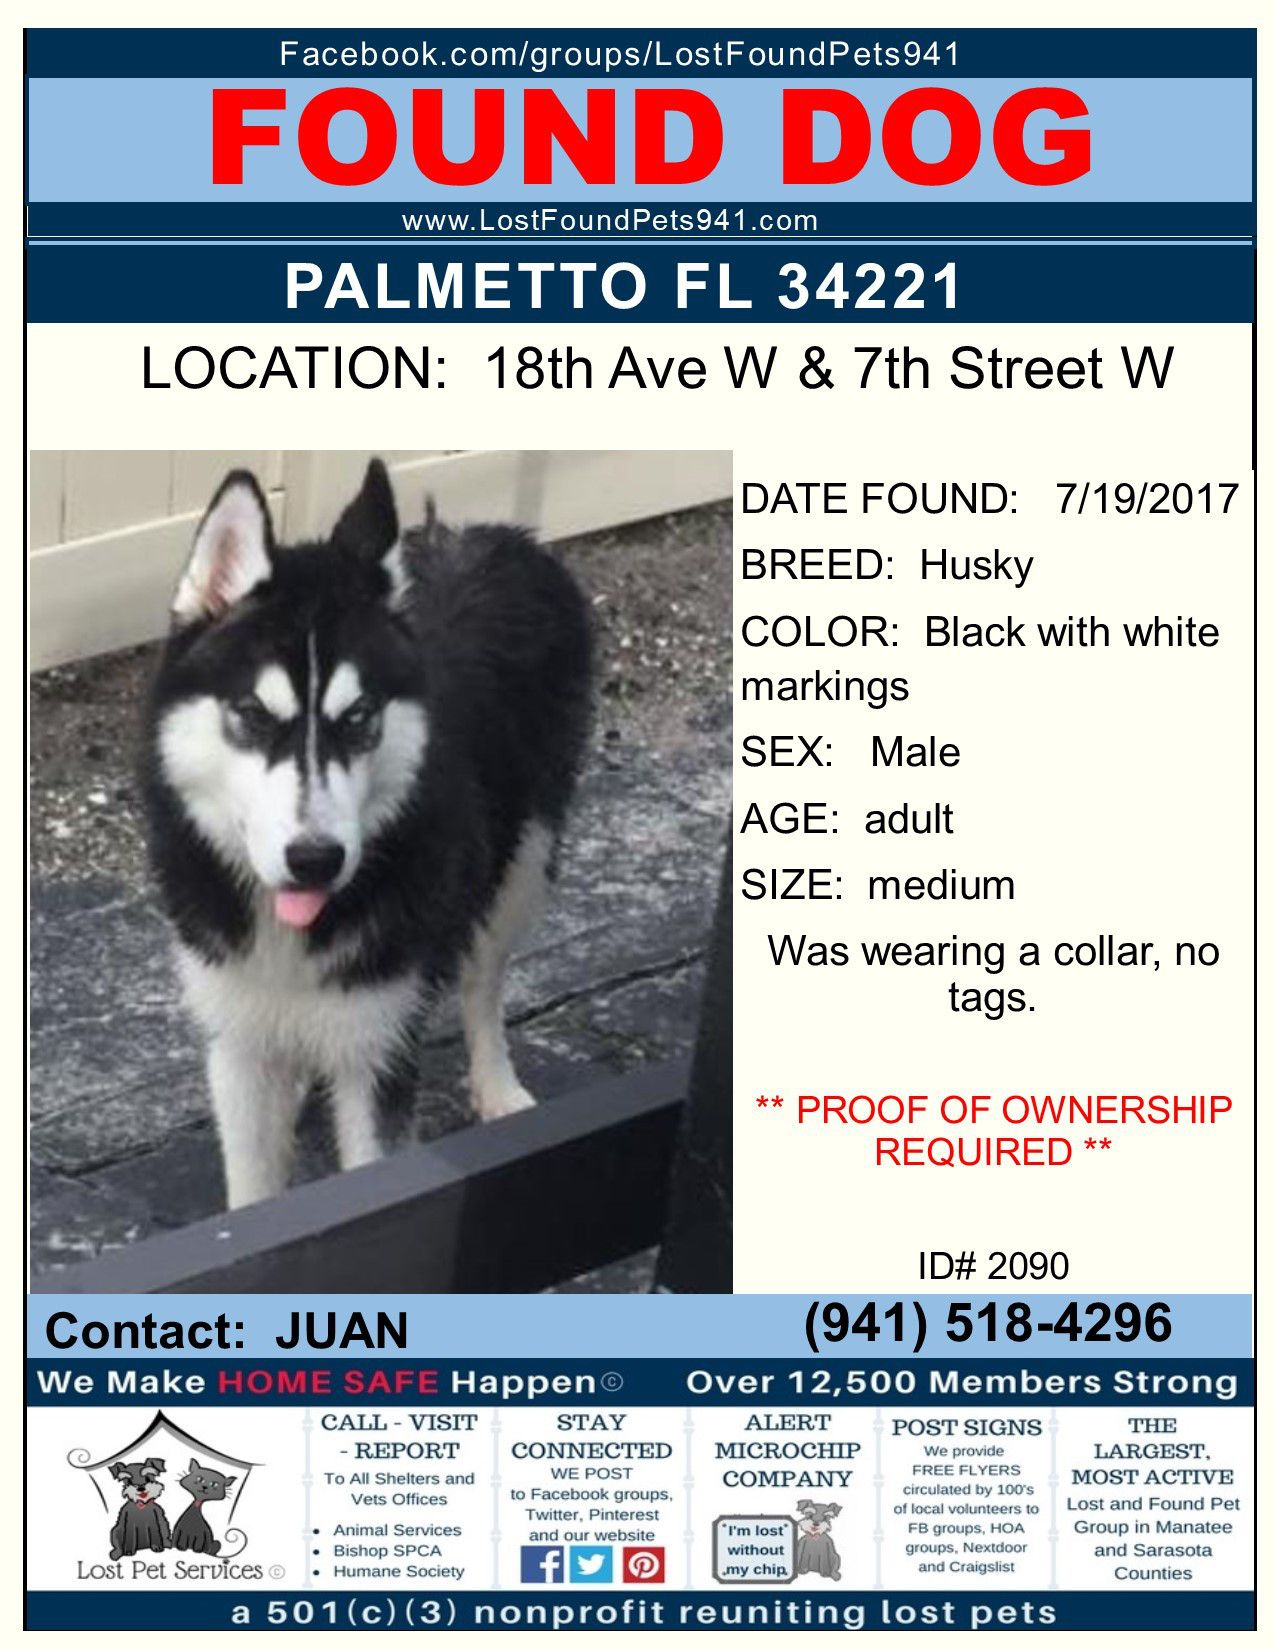 Do You Know Me Lost Found Dog Husky Missingpets Palmetto Fl 34221 Lostfoundpets941 Manateecounty Losing A Pet Service Animal Husky Colors